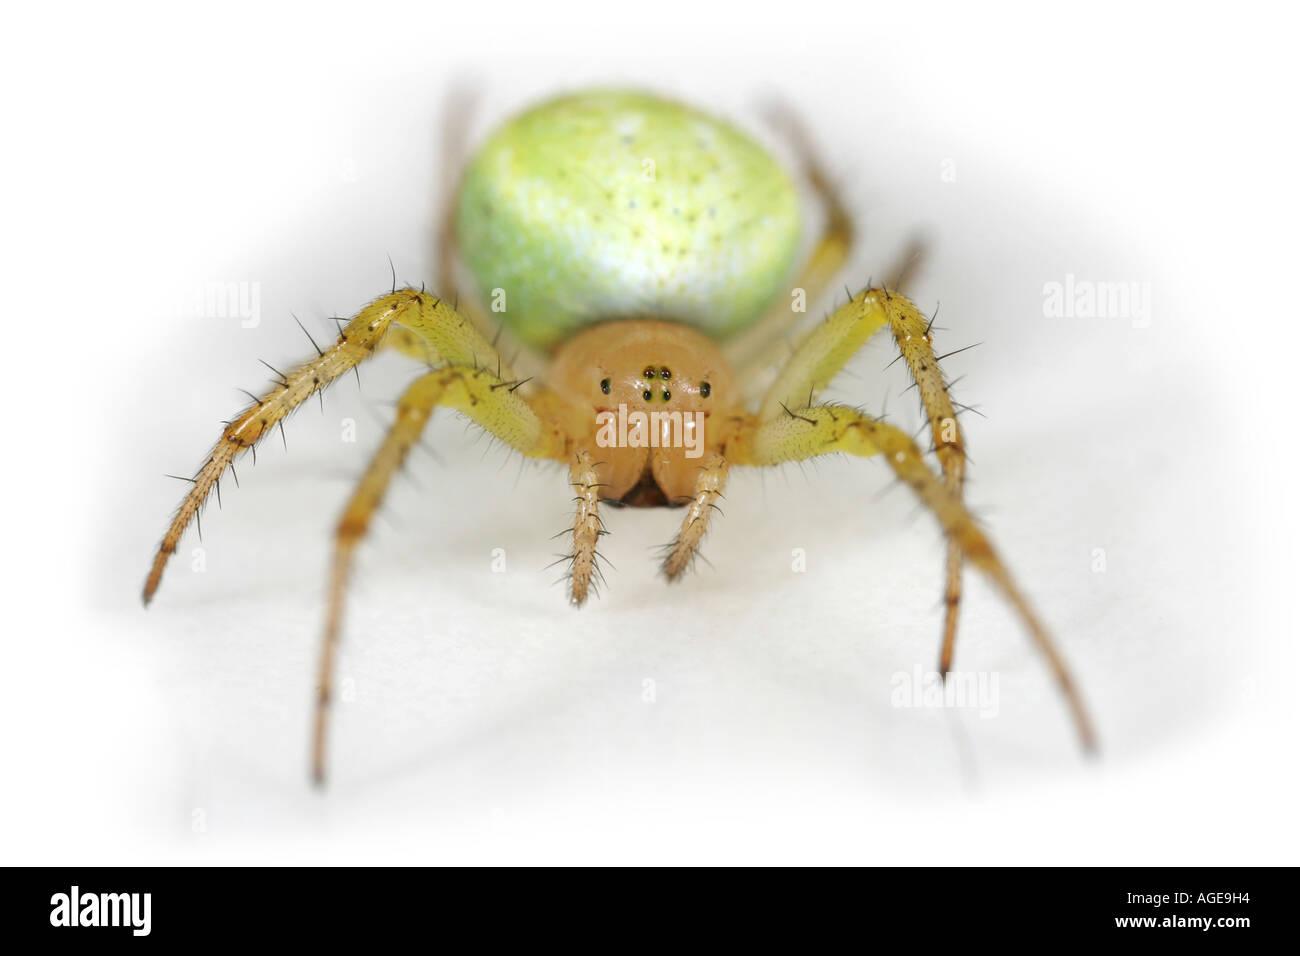 Cucumber Spider, Araniella Cucurbitina ,on white background Stock Photo